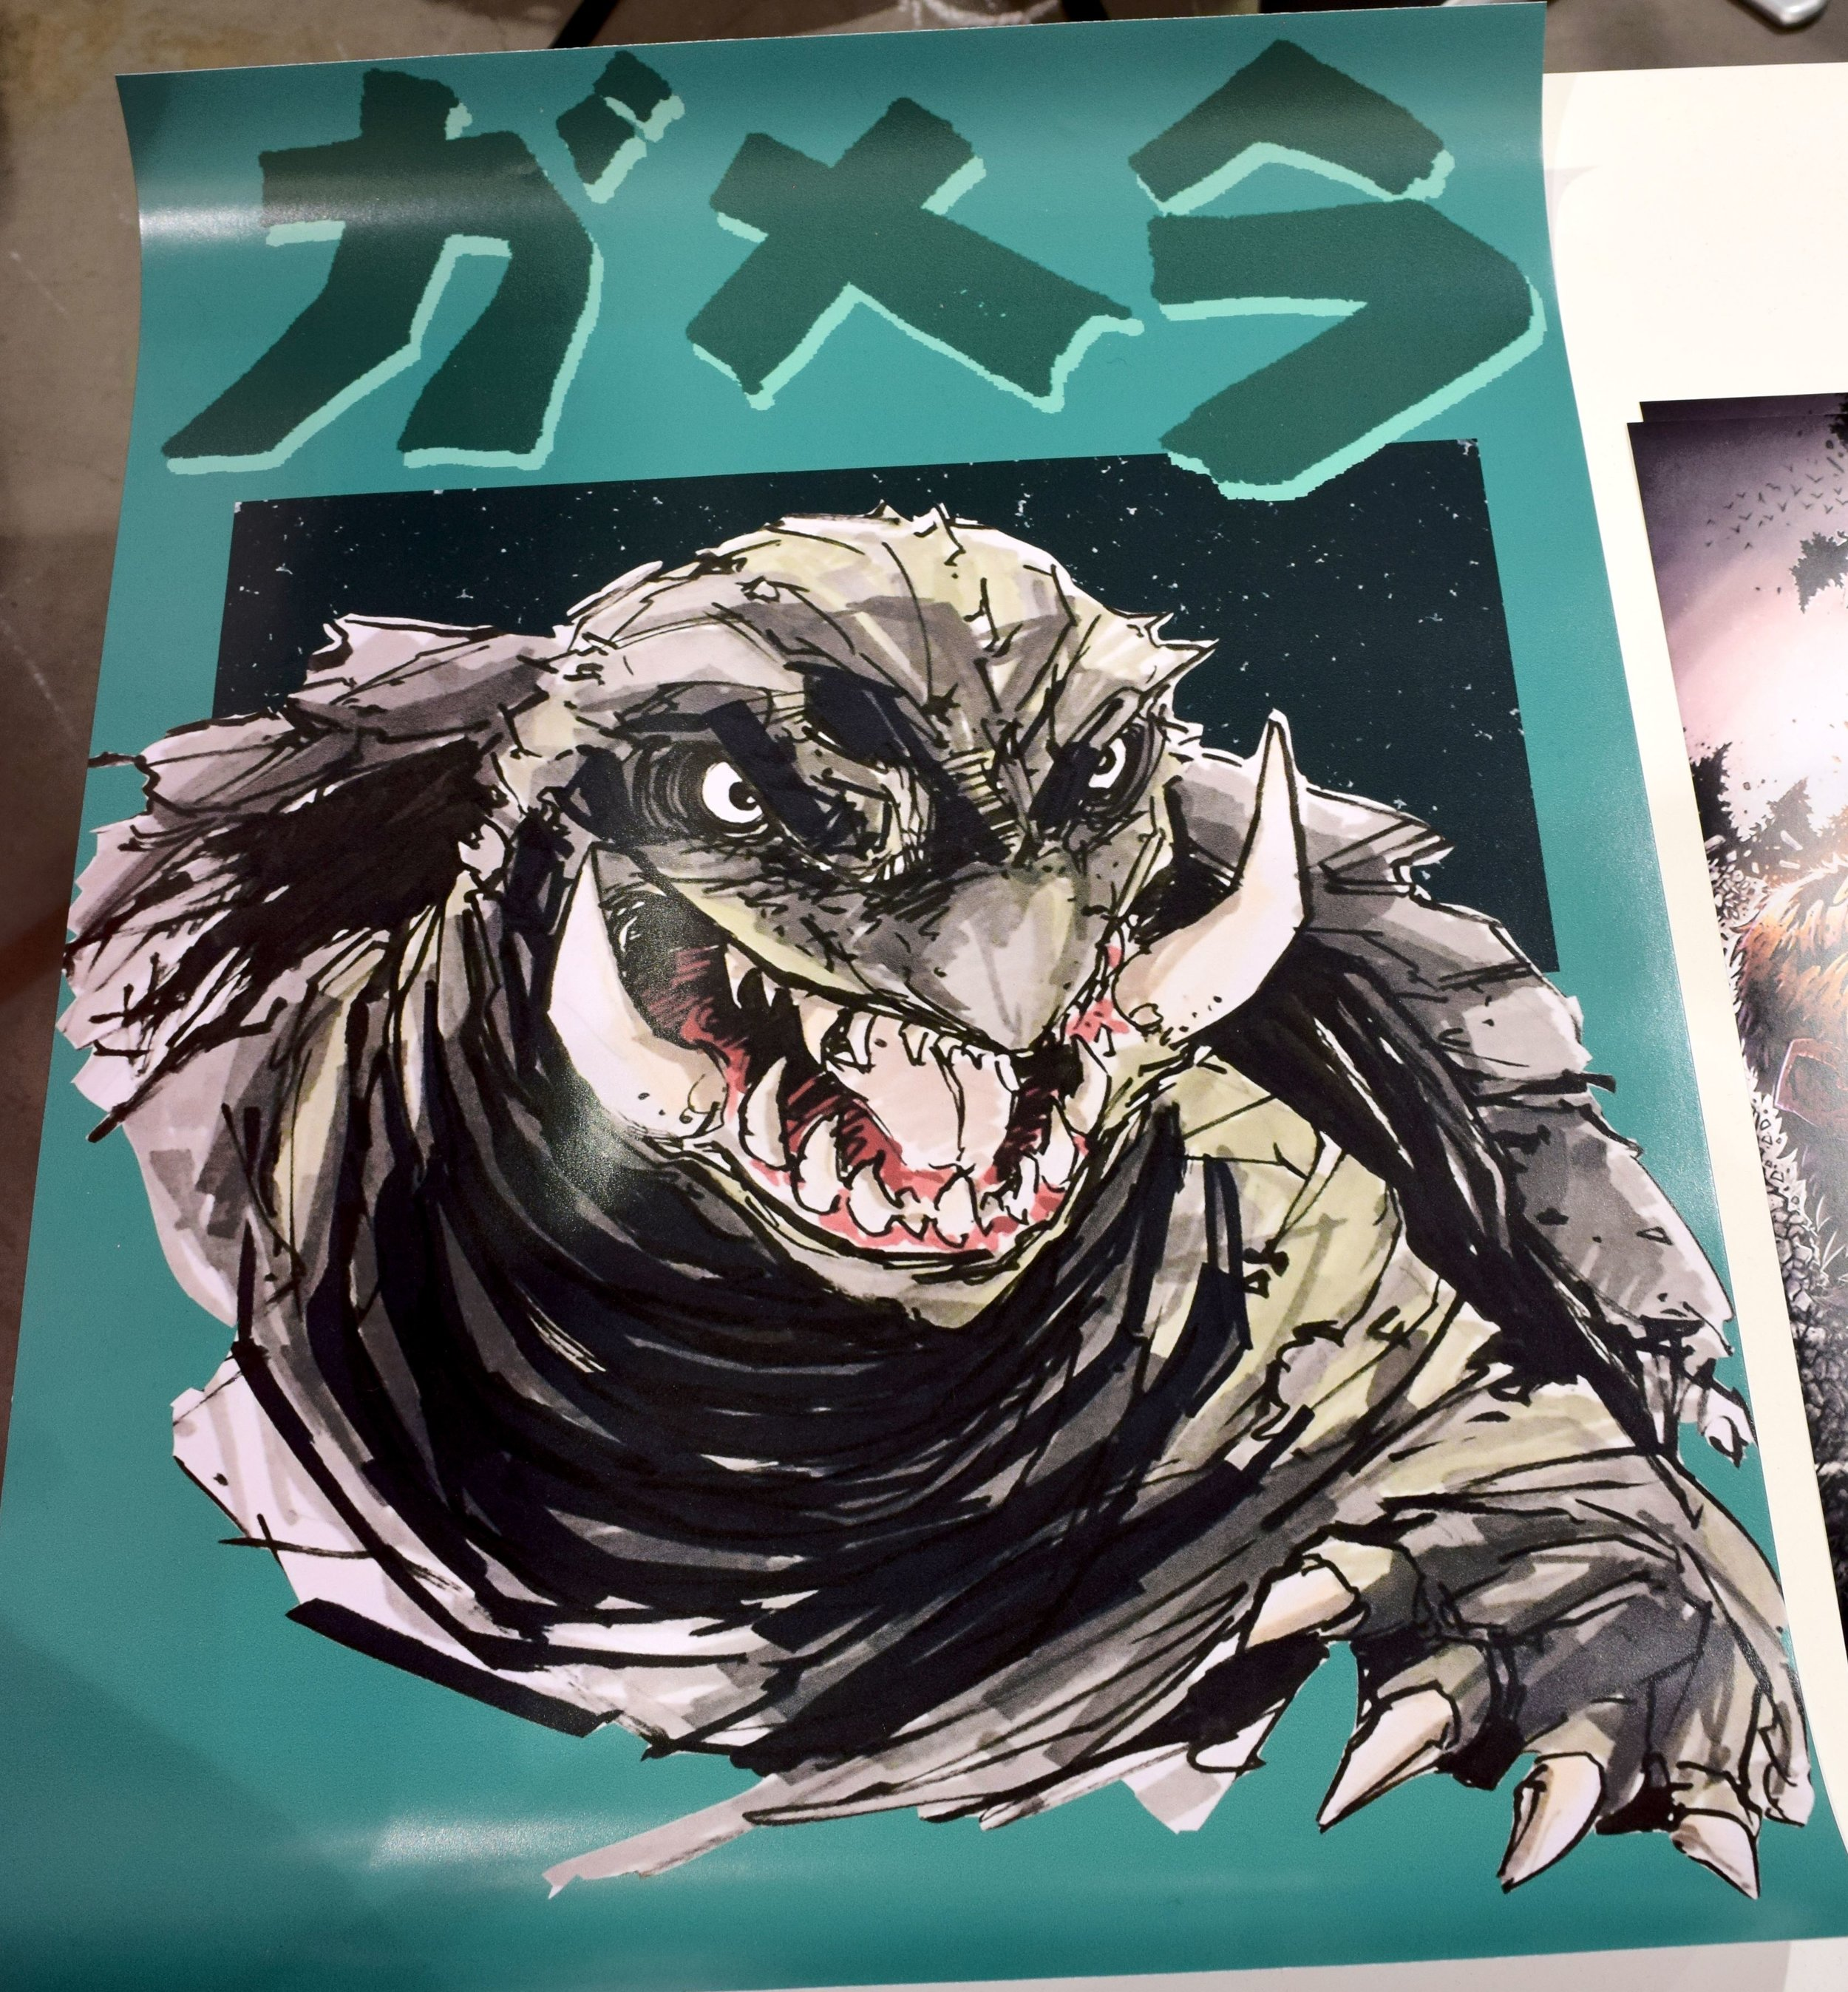 A kaiju poster at Phoenix Comic Con 2017.